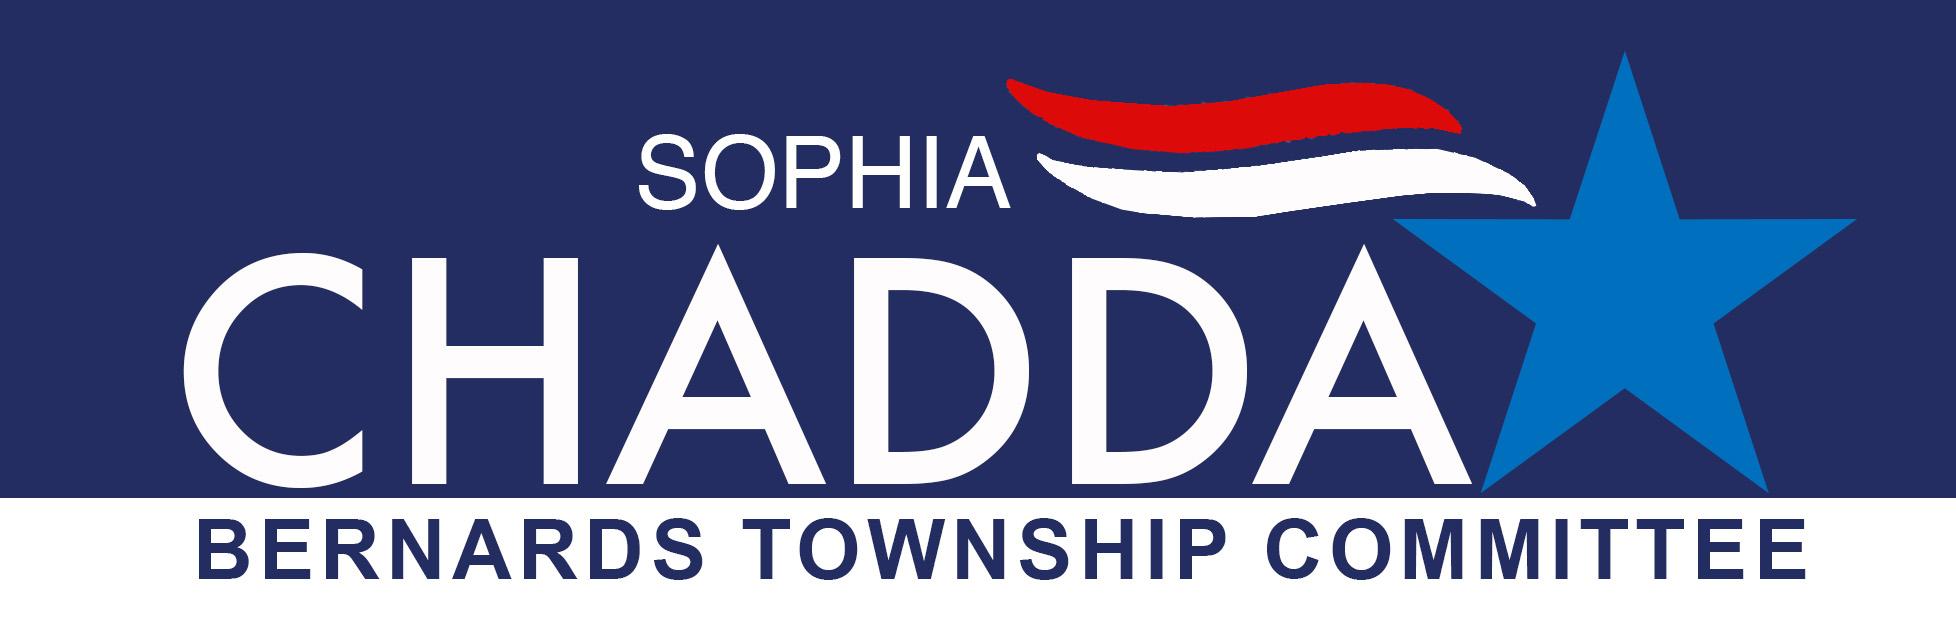 Sophia Chadda